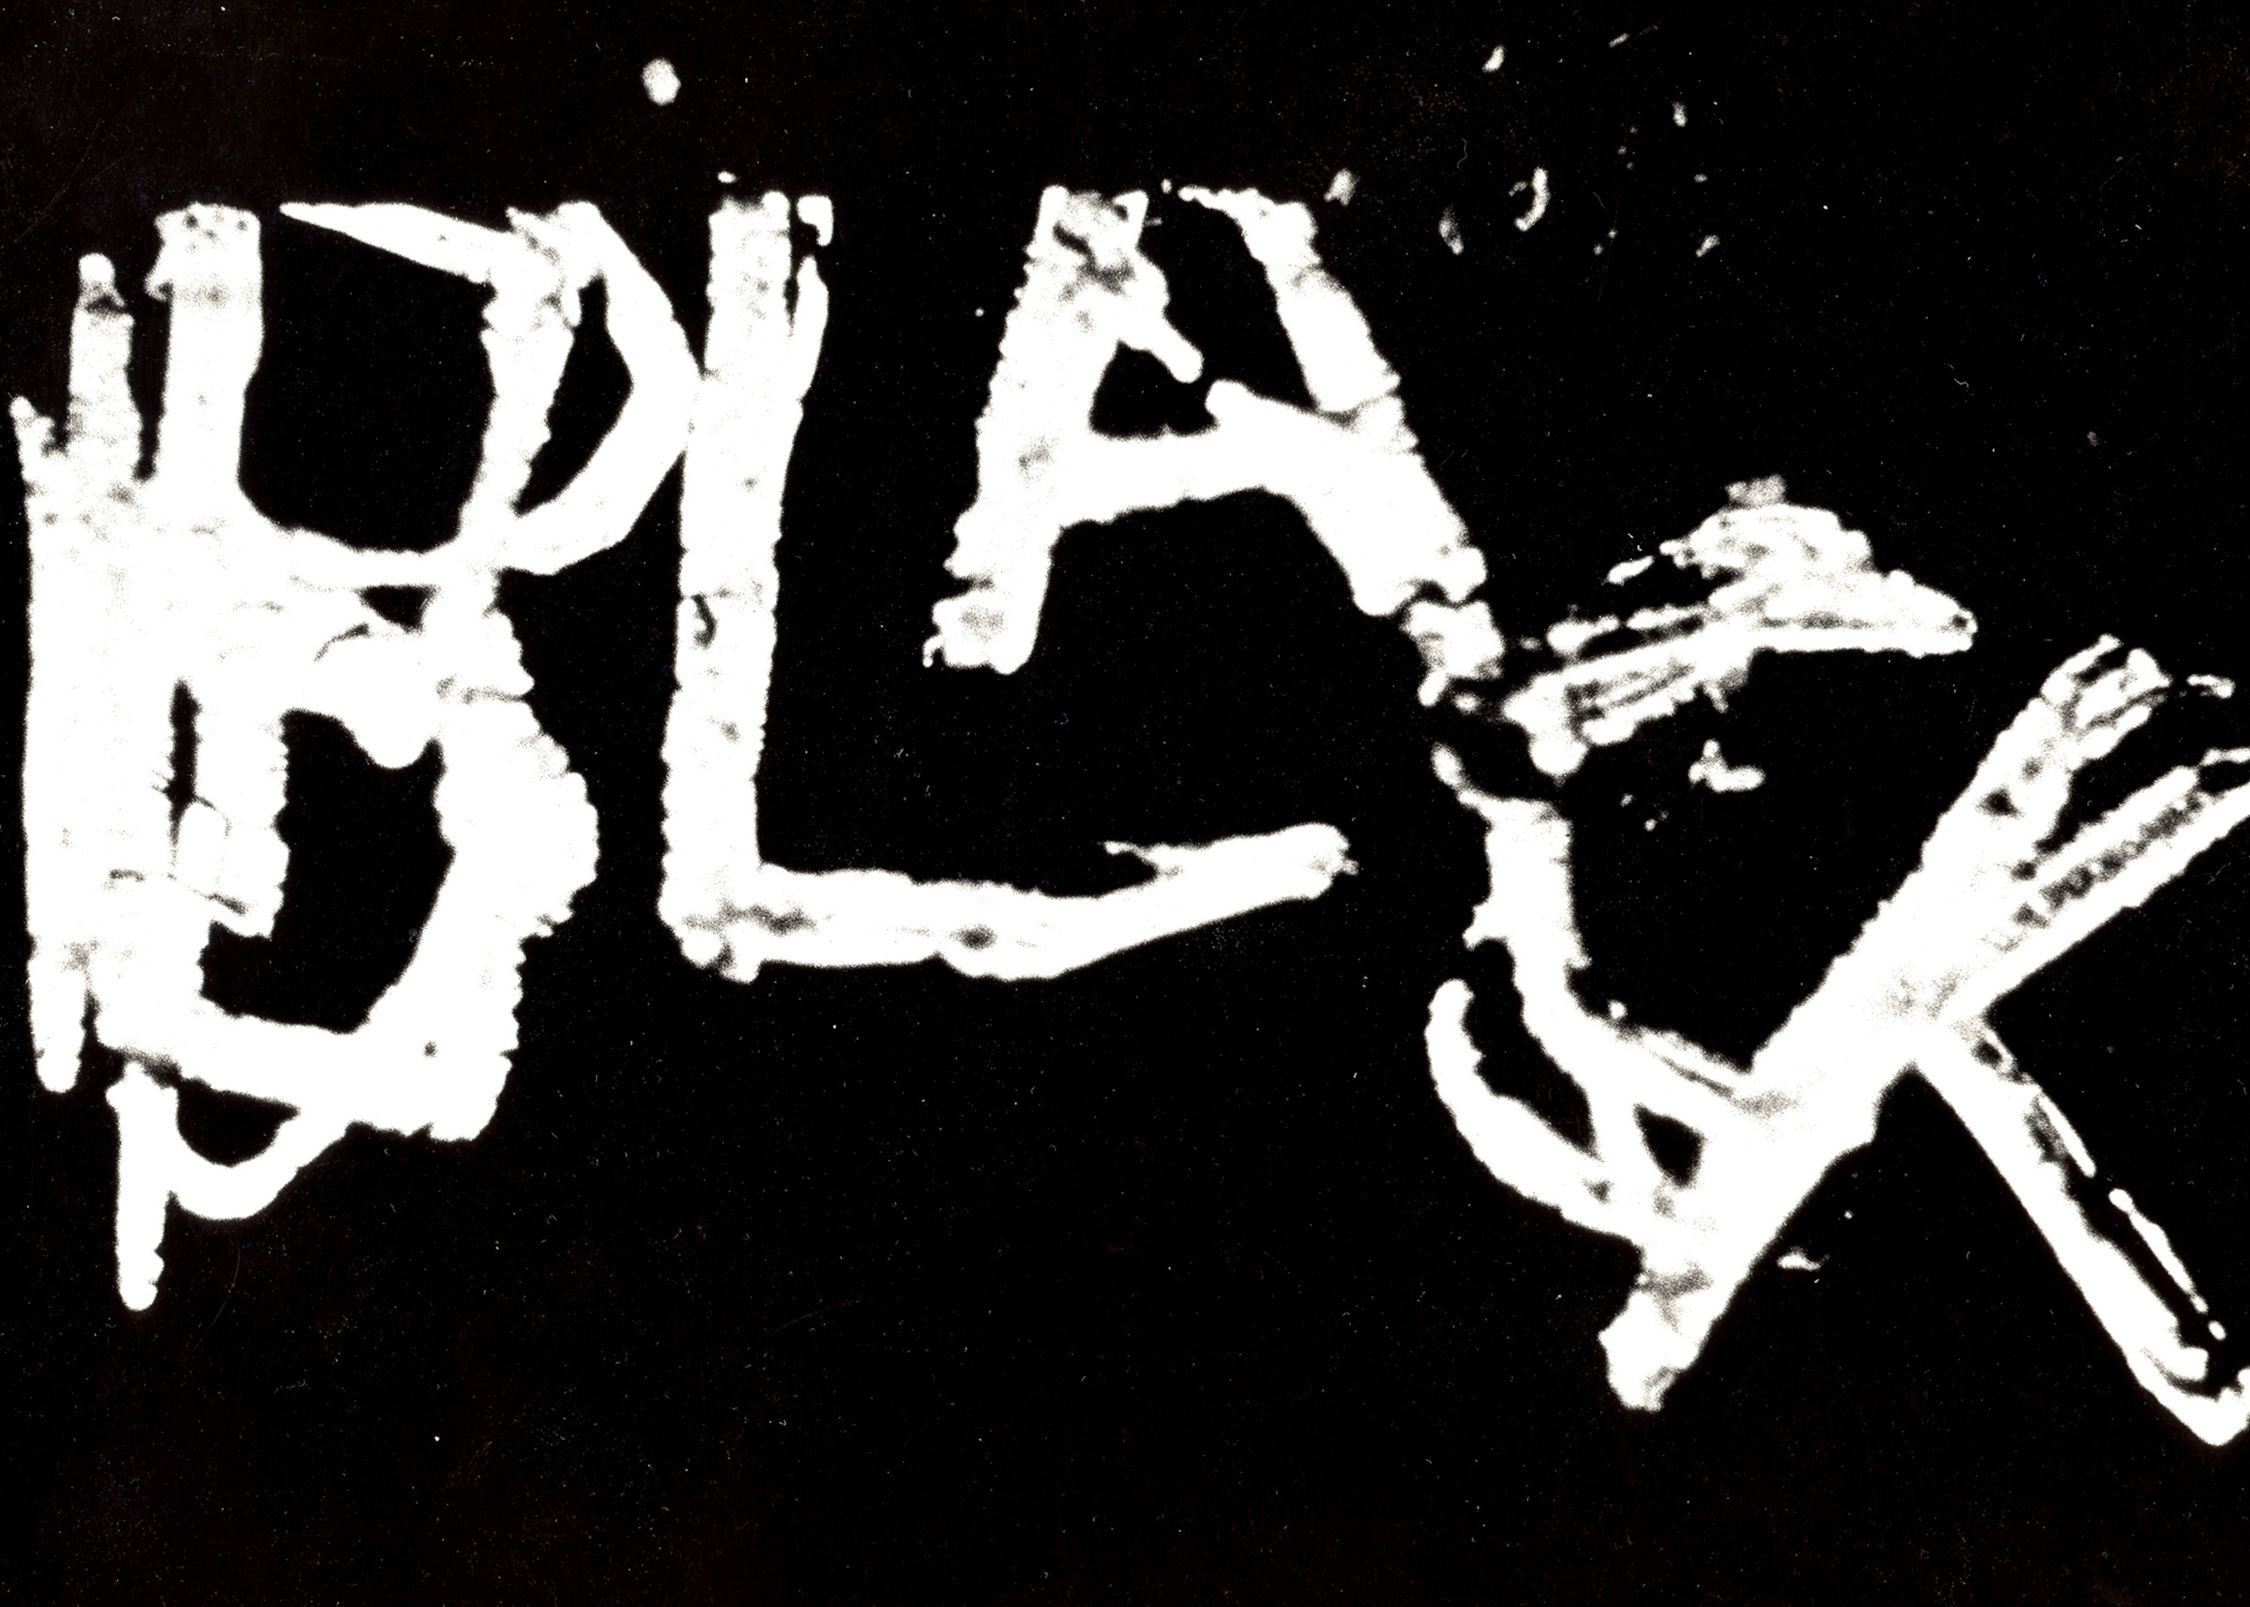 moonblack scratched black 8.jpg